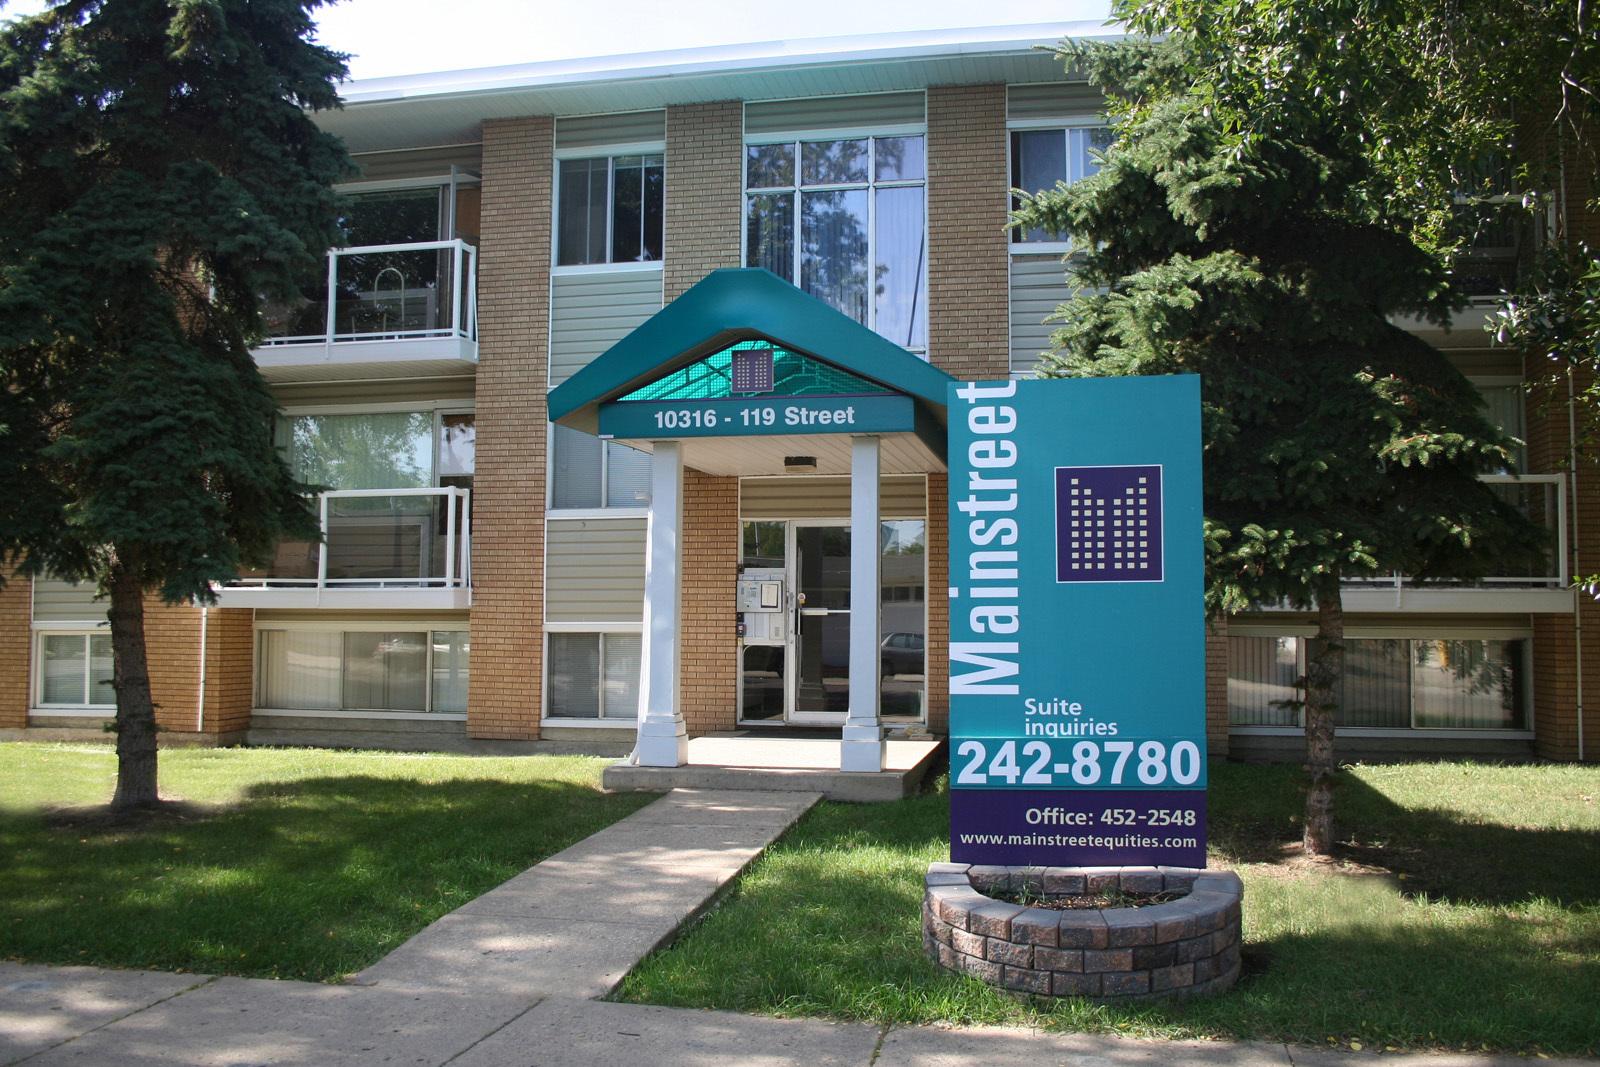 10316 119 Street NW, Edmonton, AB - $870 CAD/ month